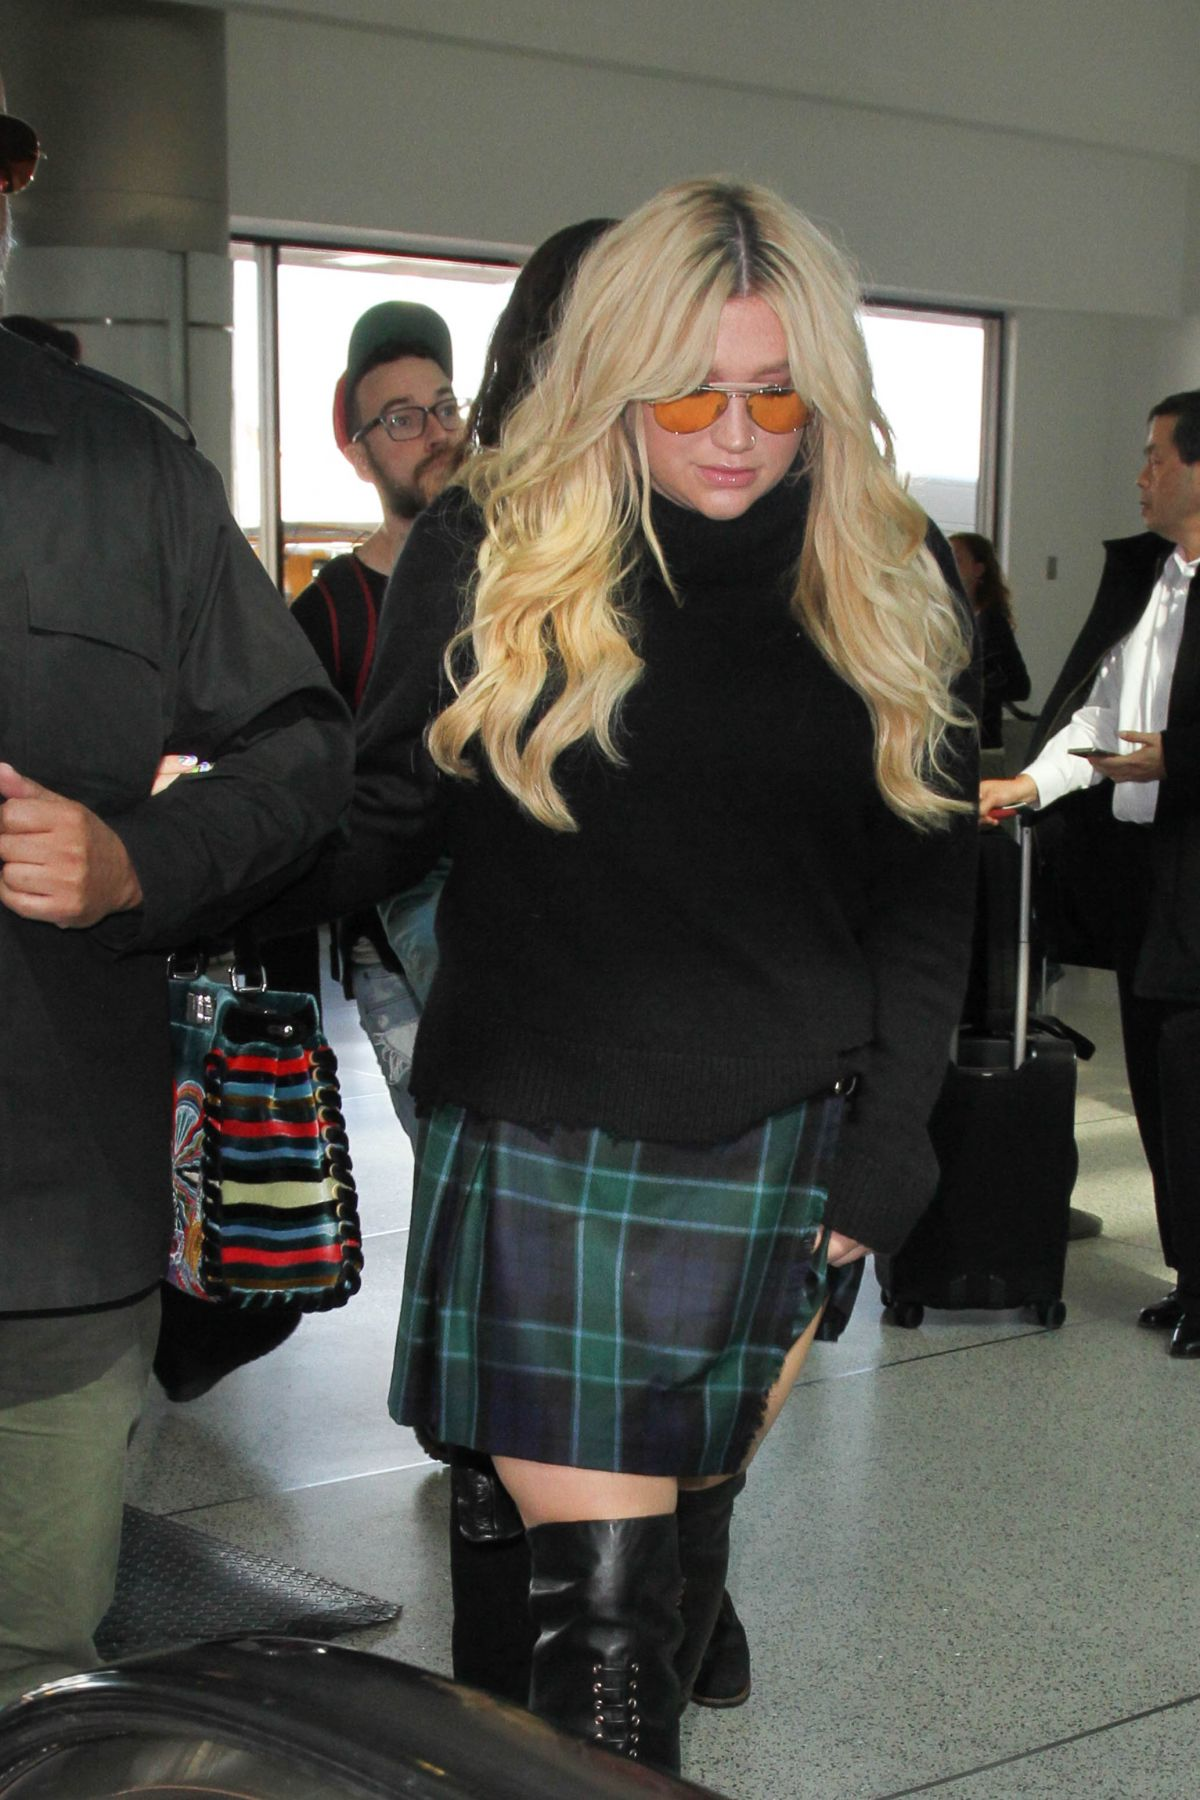 KESHA SEBERT at Los Angeles International Airport 01/26/2017